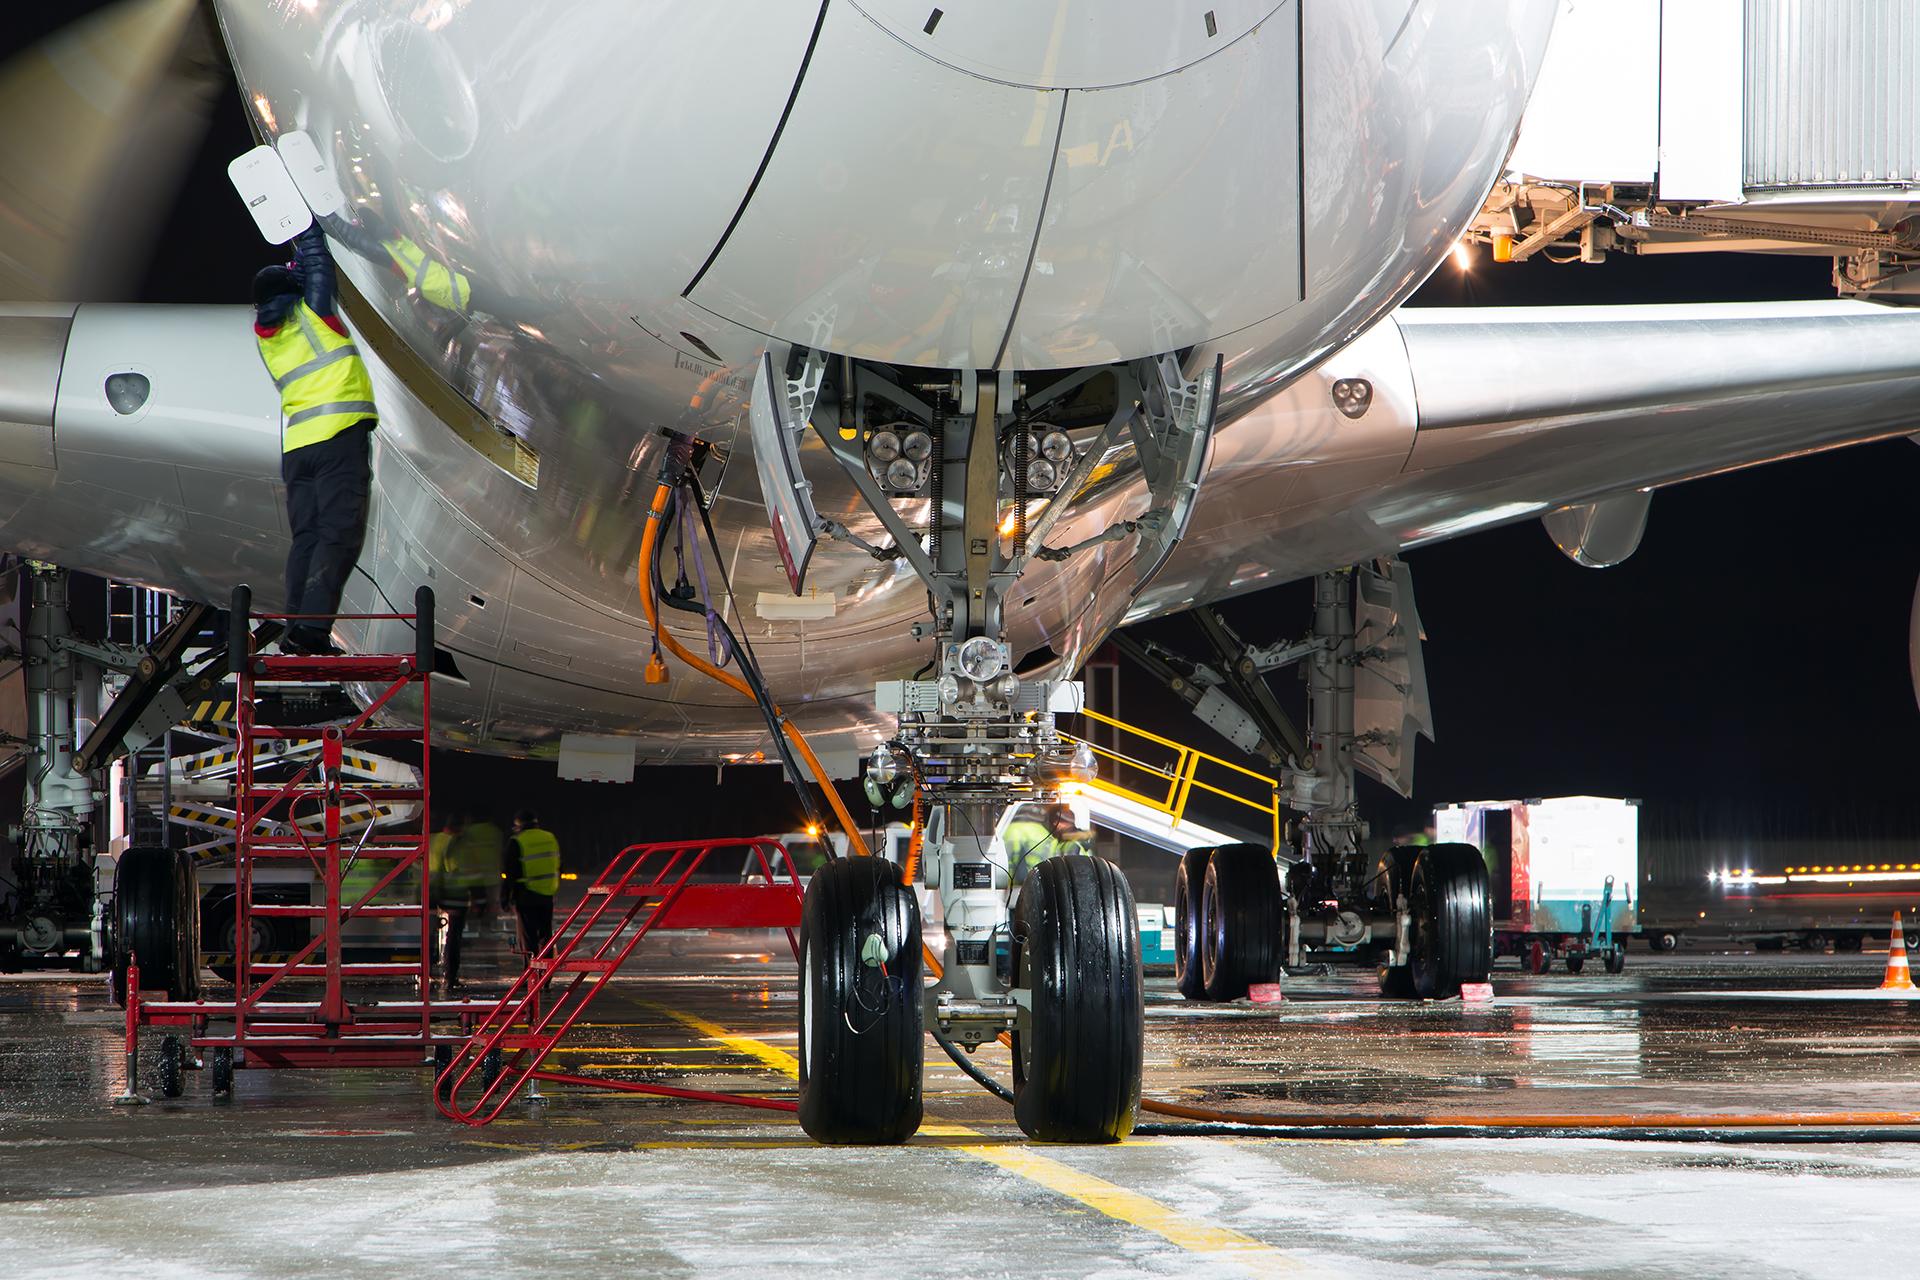 Staff perform maintenance on an aircraft at night